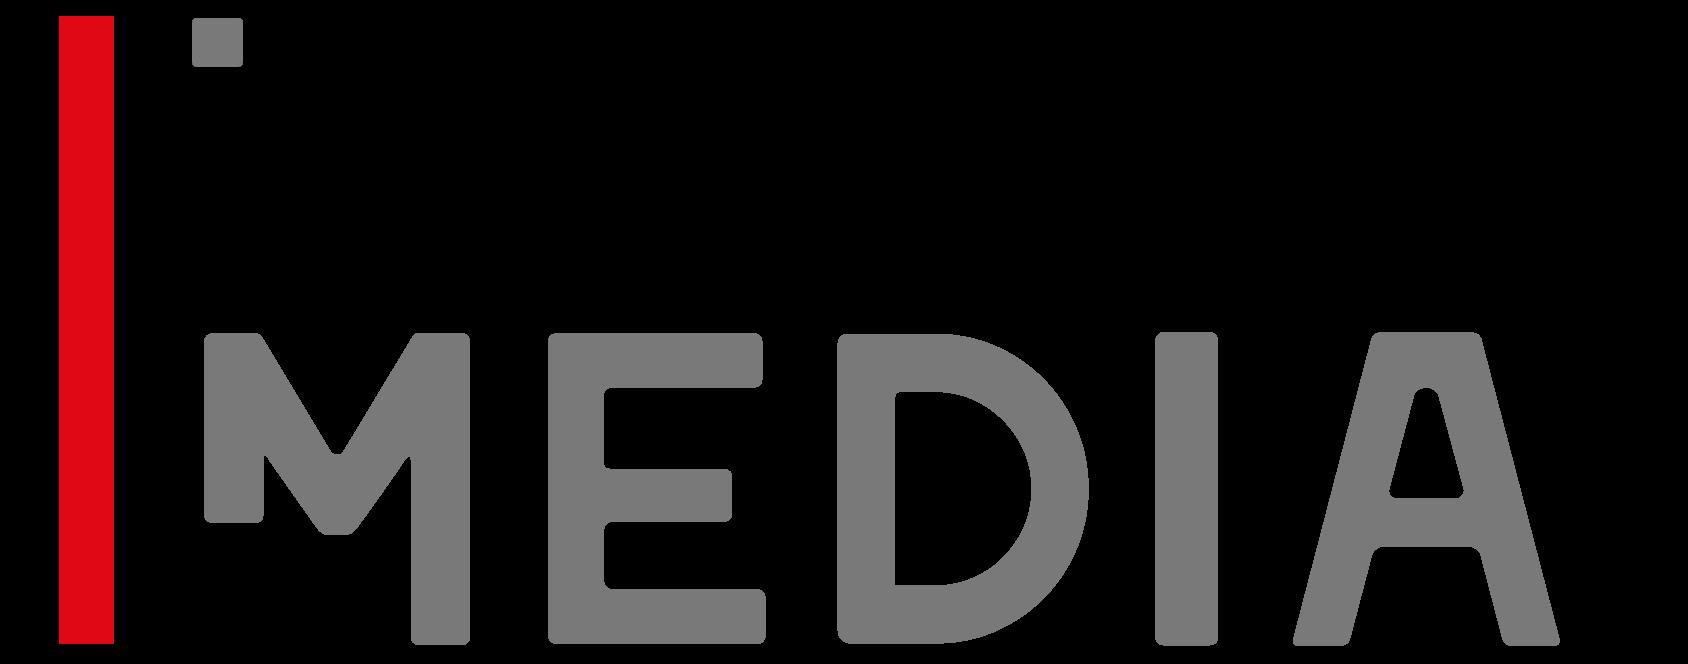 Unbind Media company logo